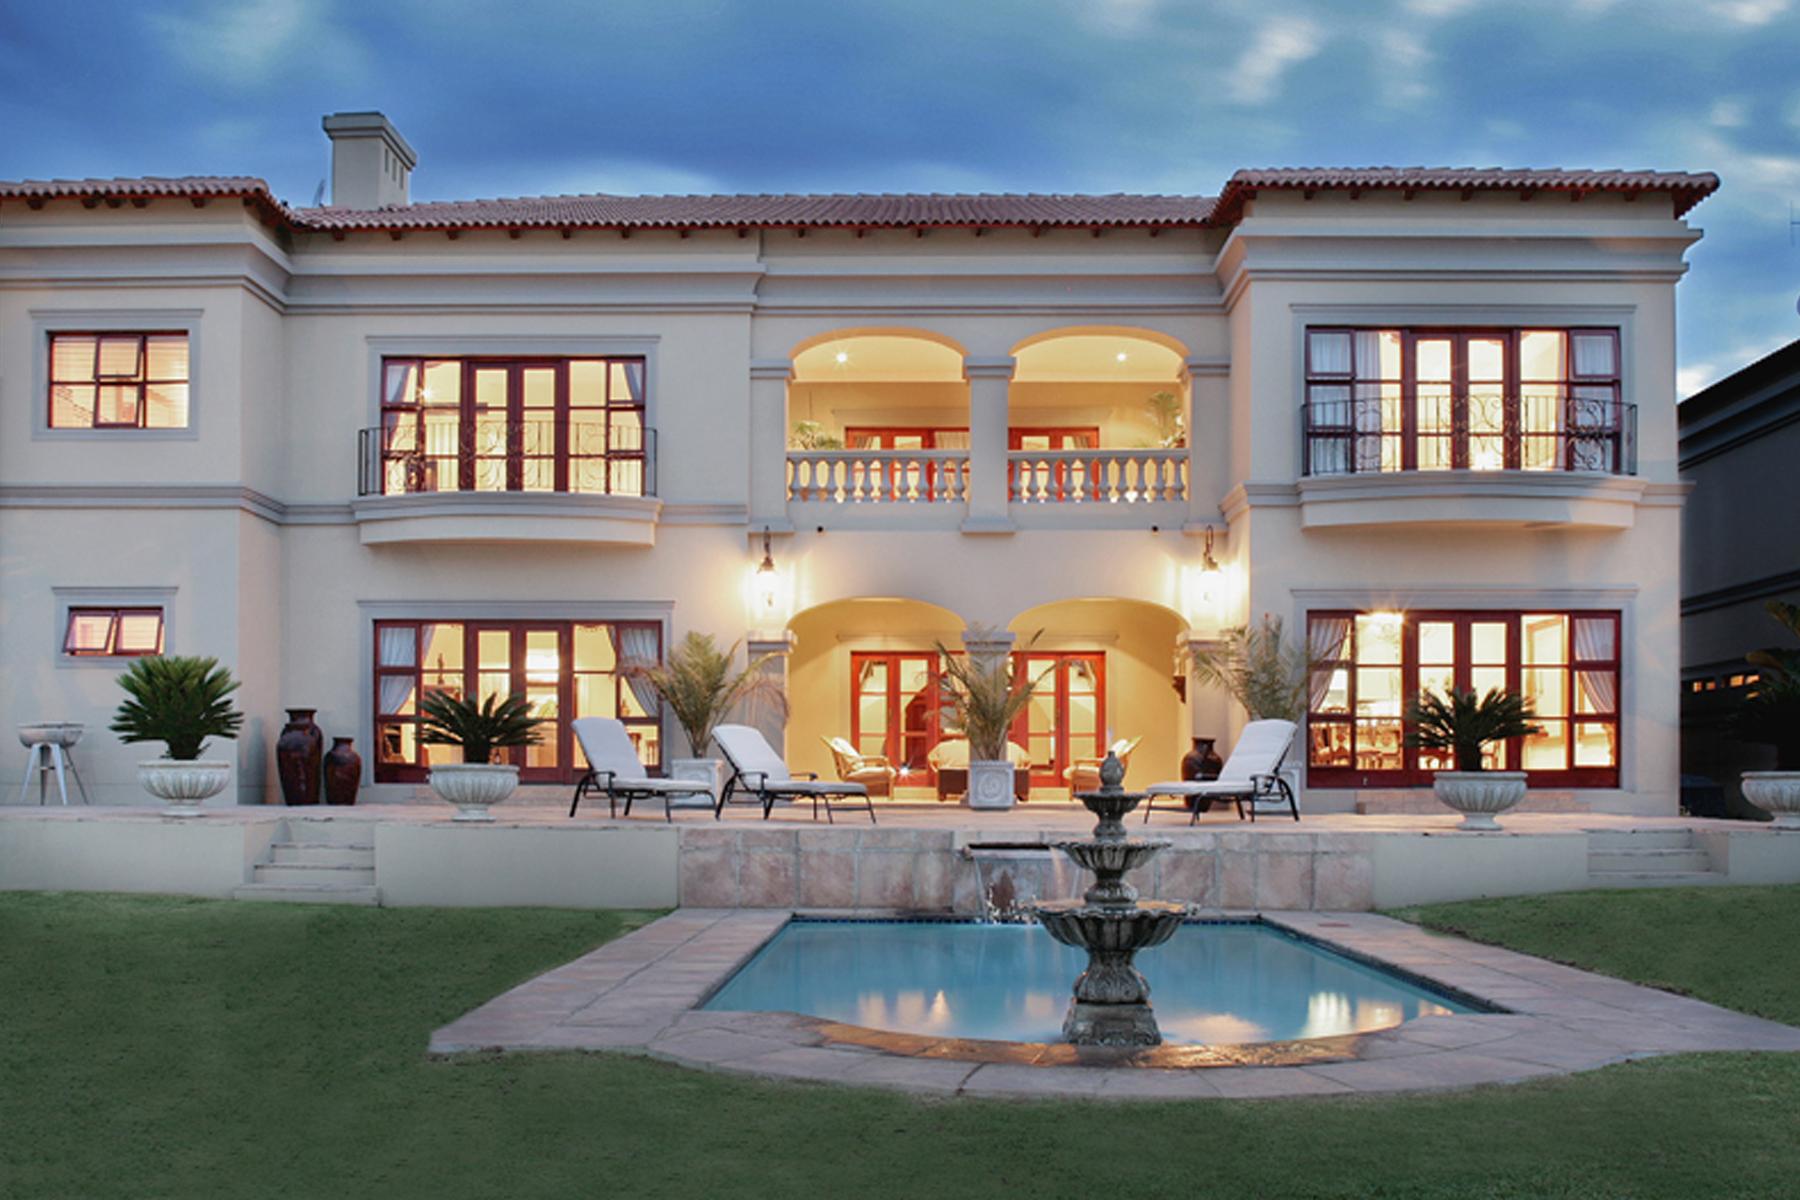 Single Family Home for Sale at Bryanston Johannesburg, Gauteng, South Africa